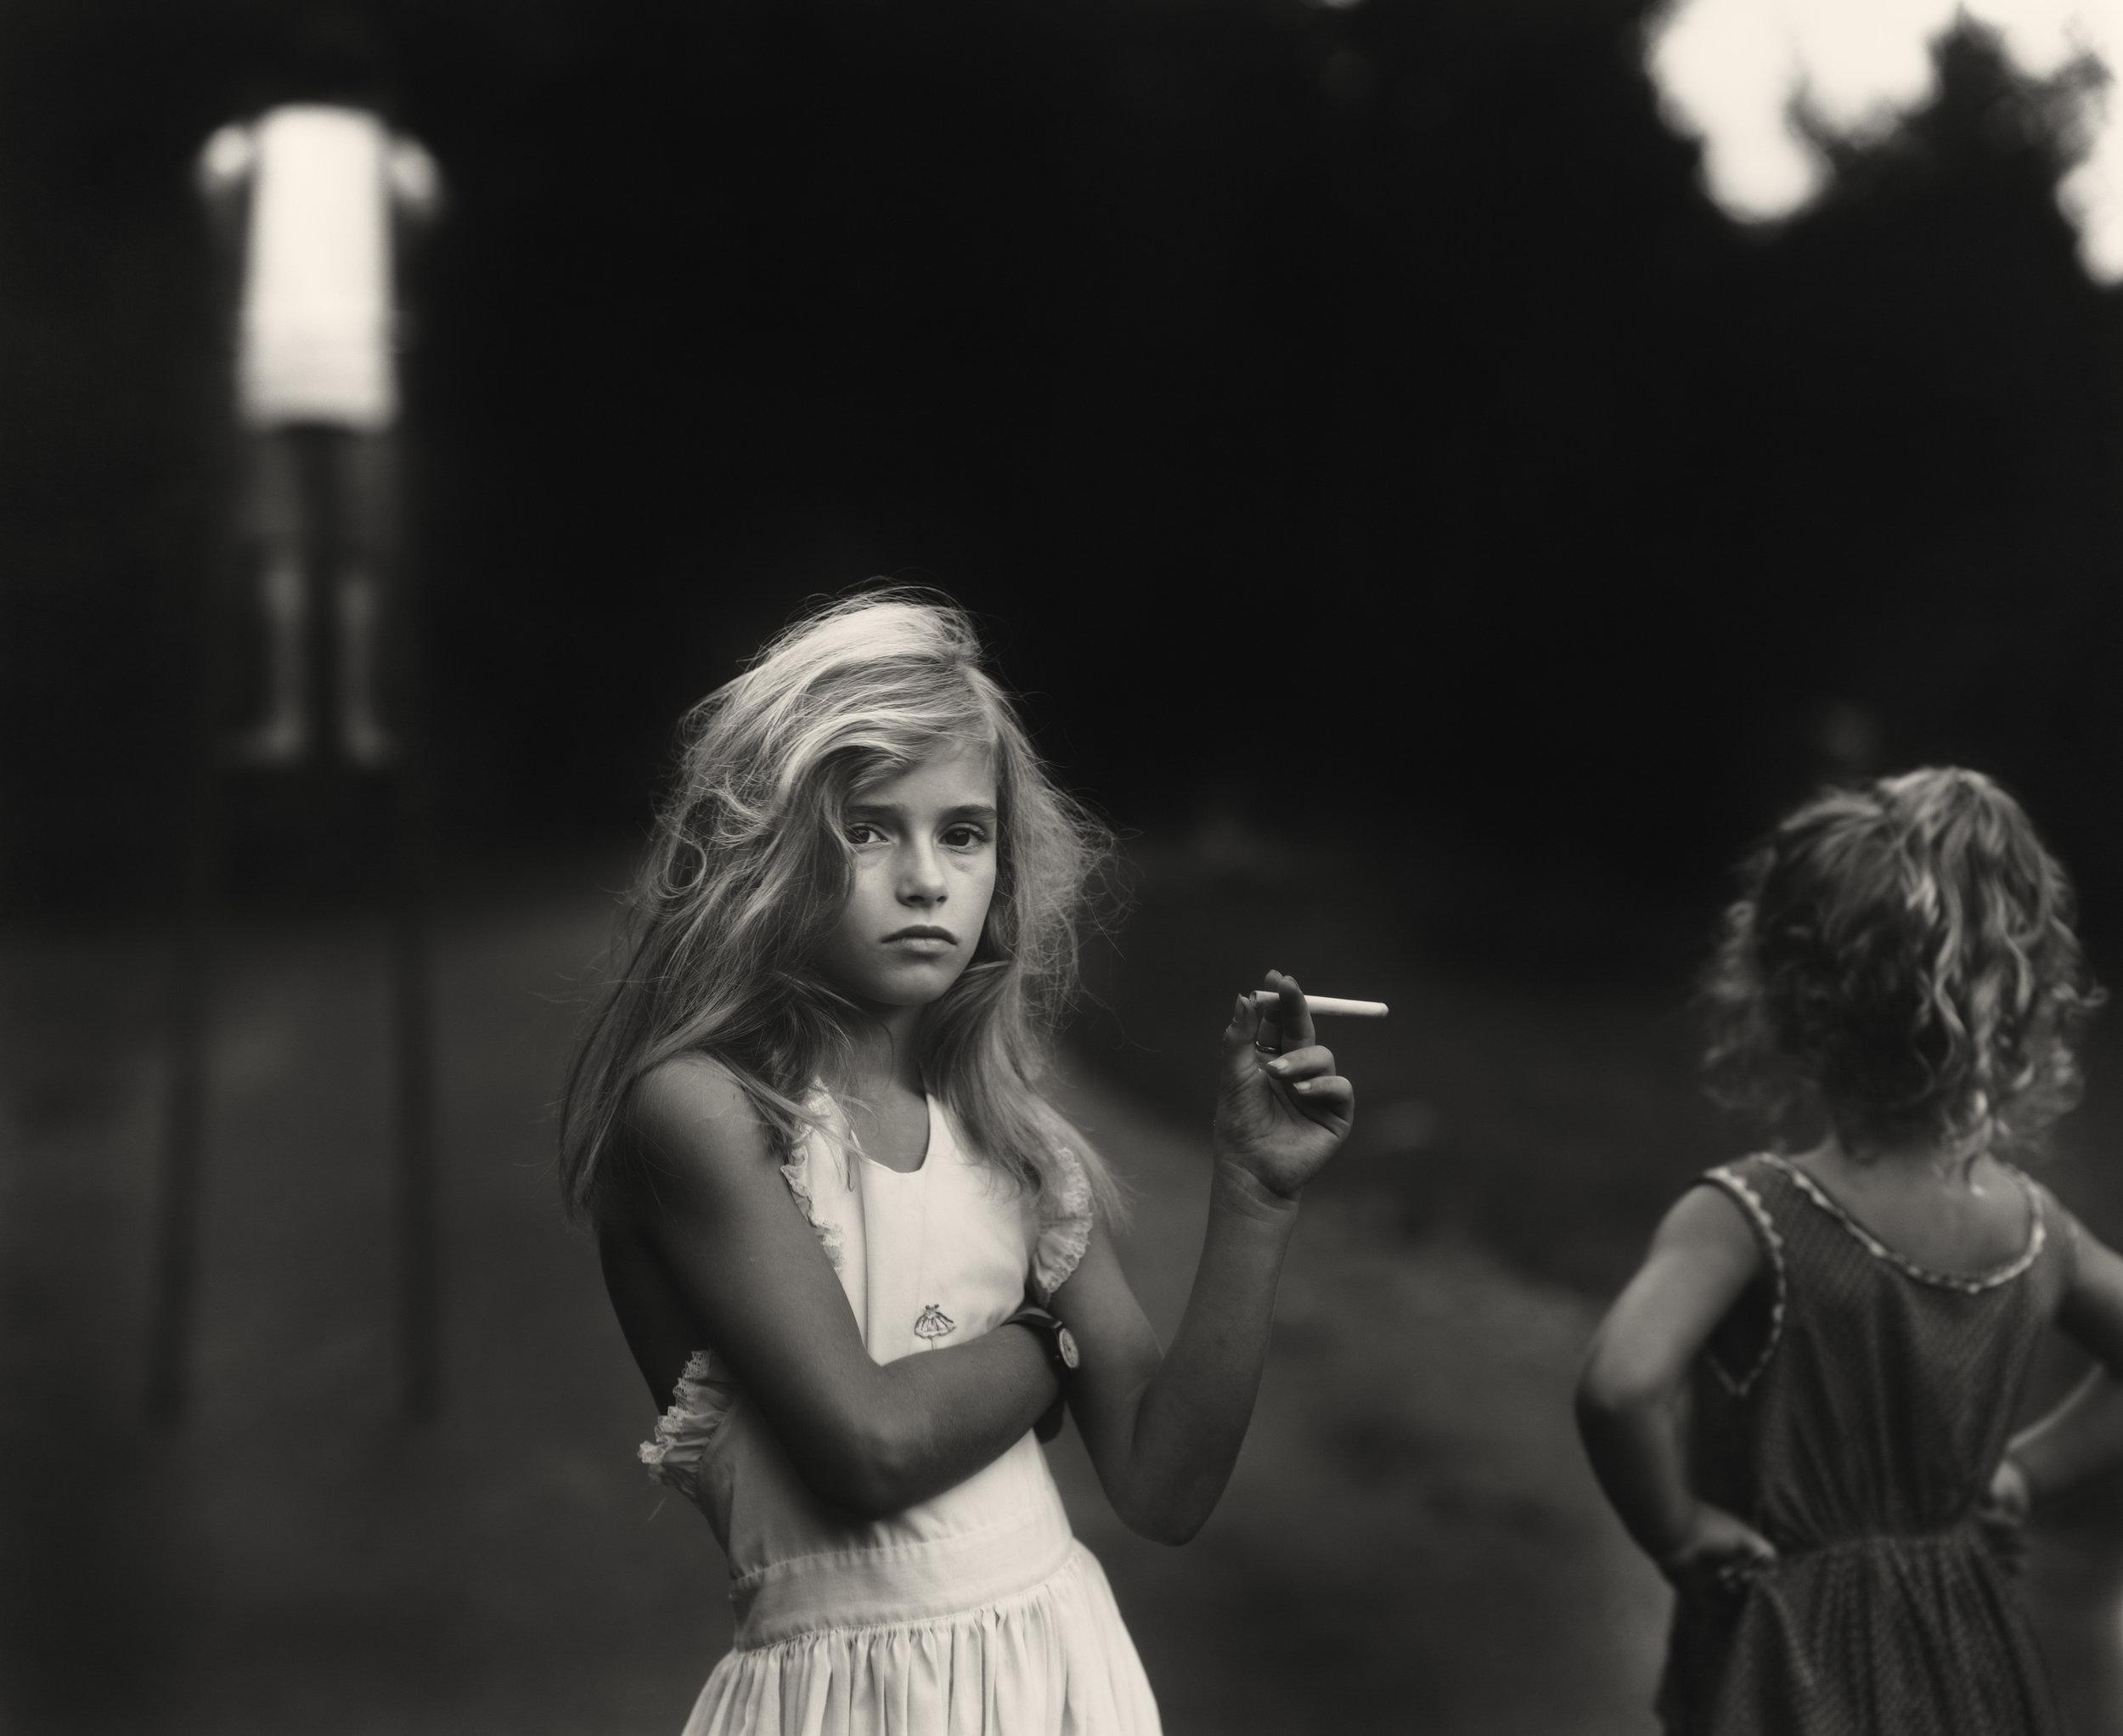 - Candy CigaretteSally MannLoaned to the Nasher Museum of Art at Duke UniversityDurham, North Carolina, 2013